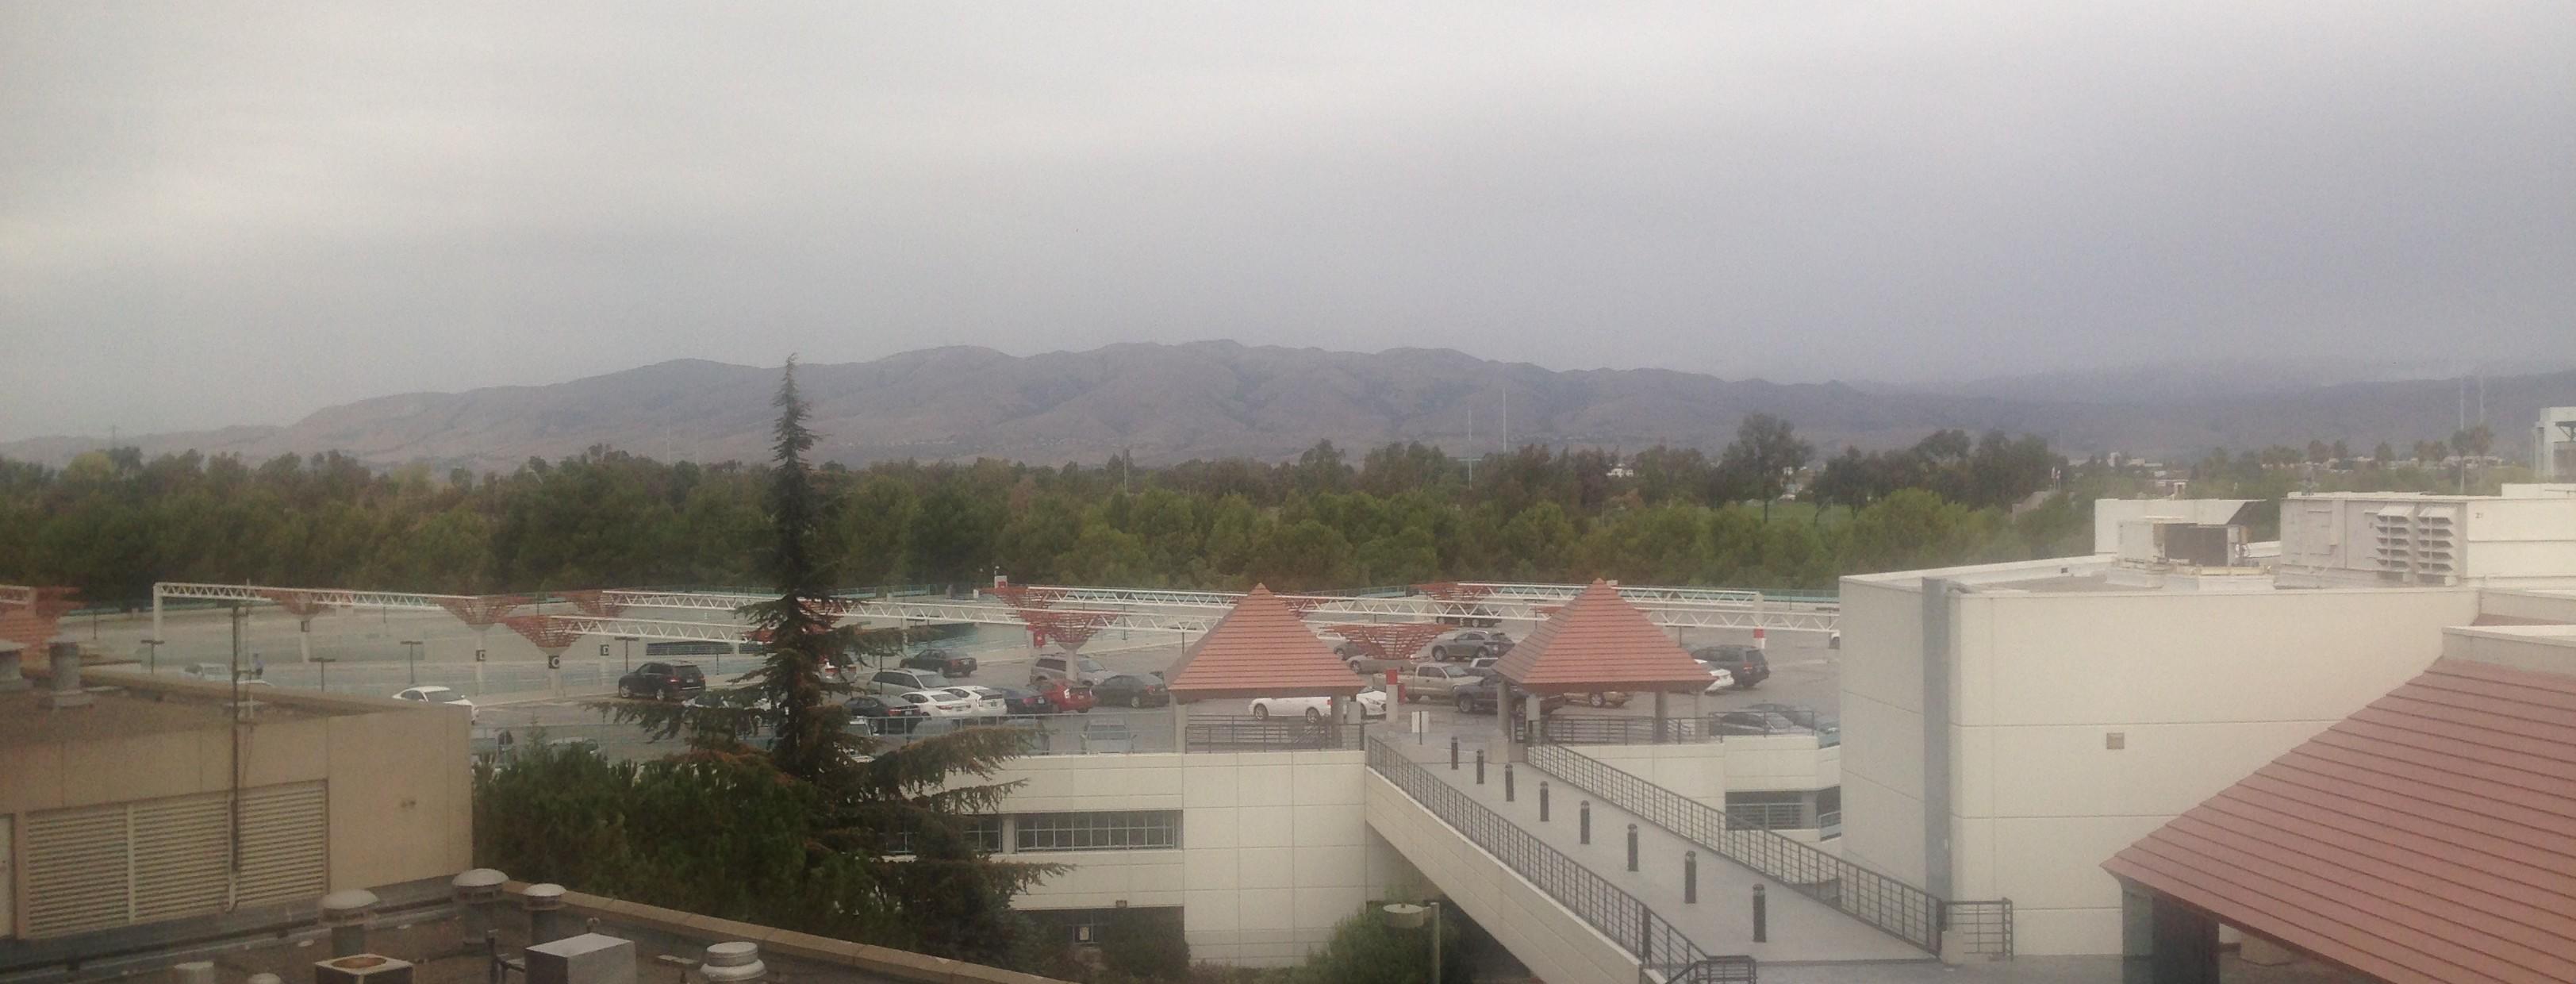 Hyatt Santa Clara view